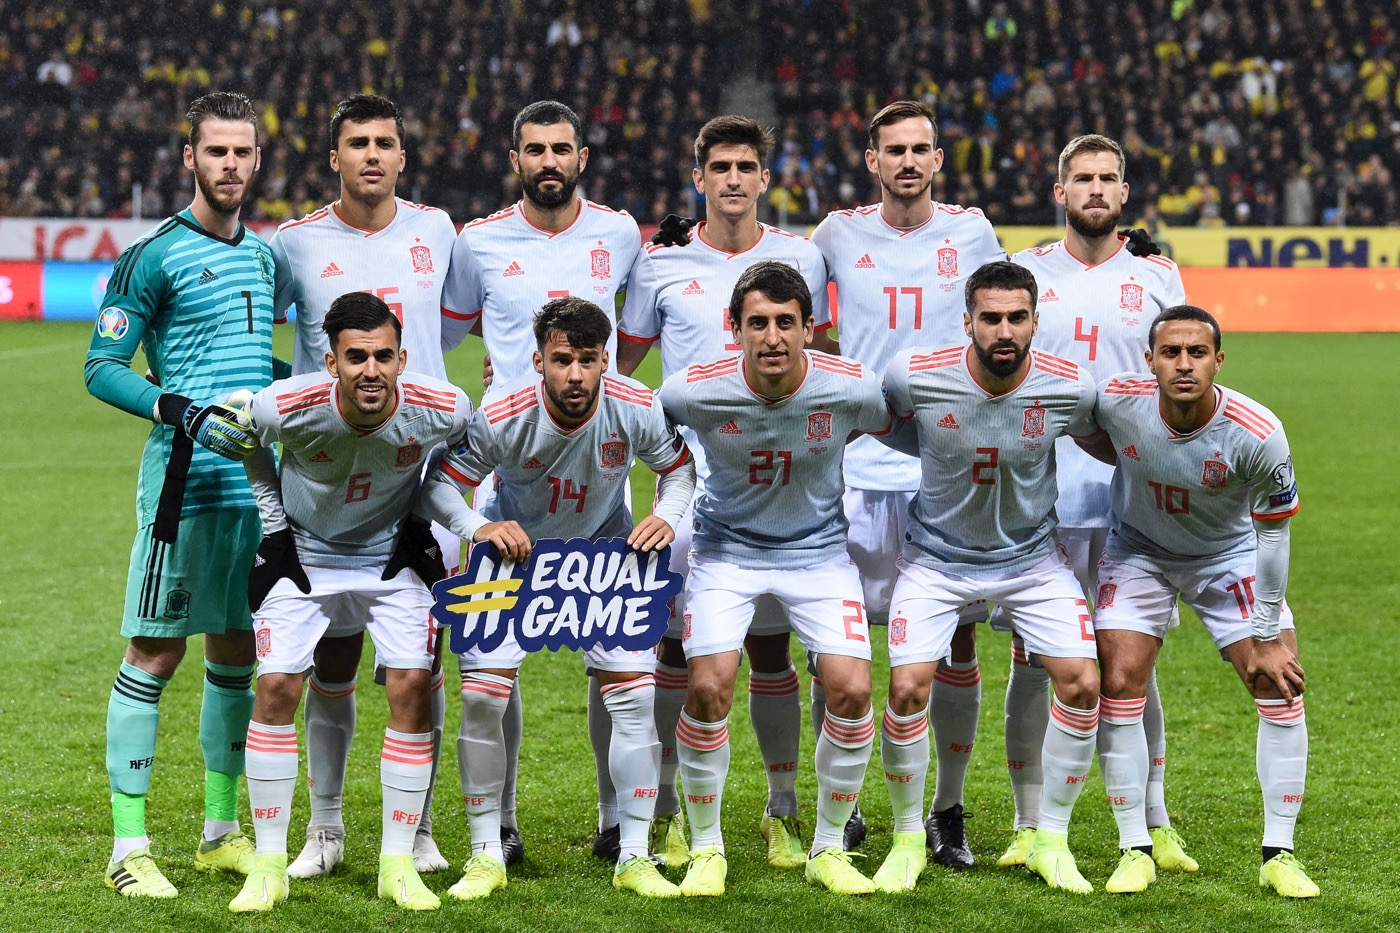 Spaniens Nationalmannschaft gegen Schweden im Oktober 2019. (Photo by Jonathan NACKSTRAND / AFP)